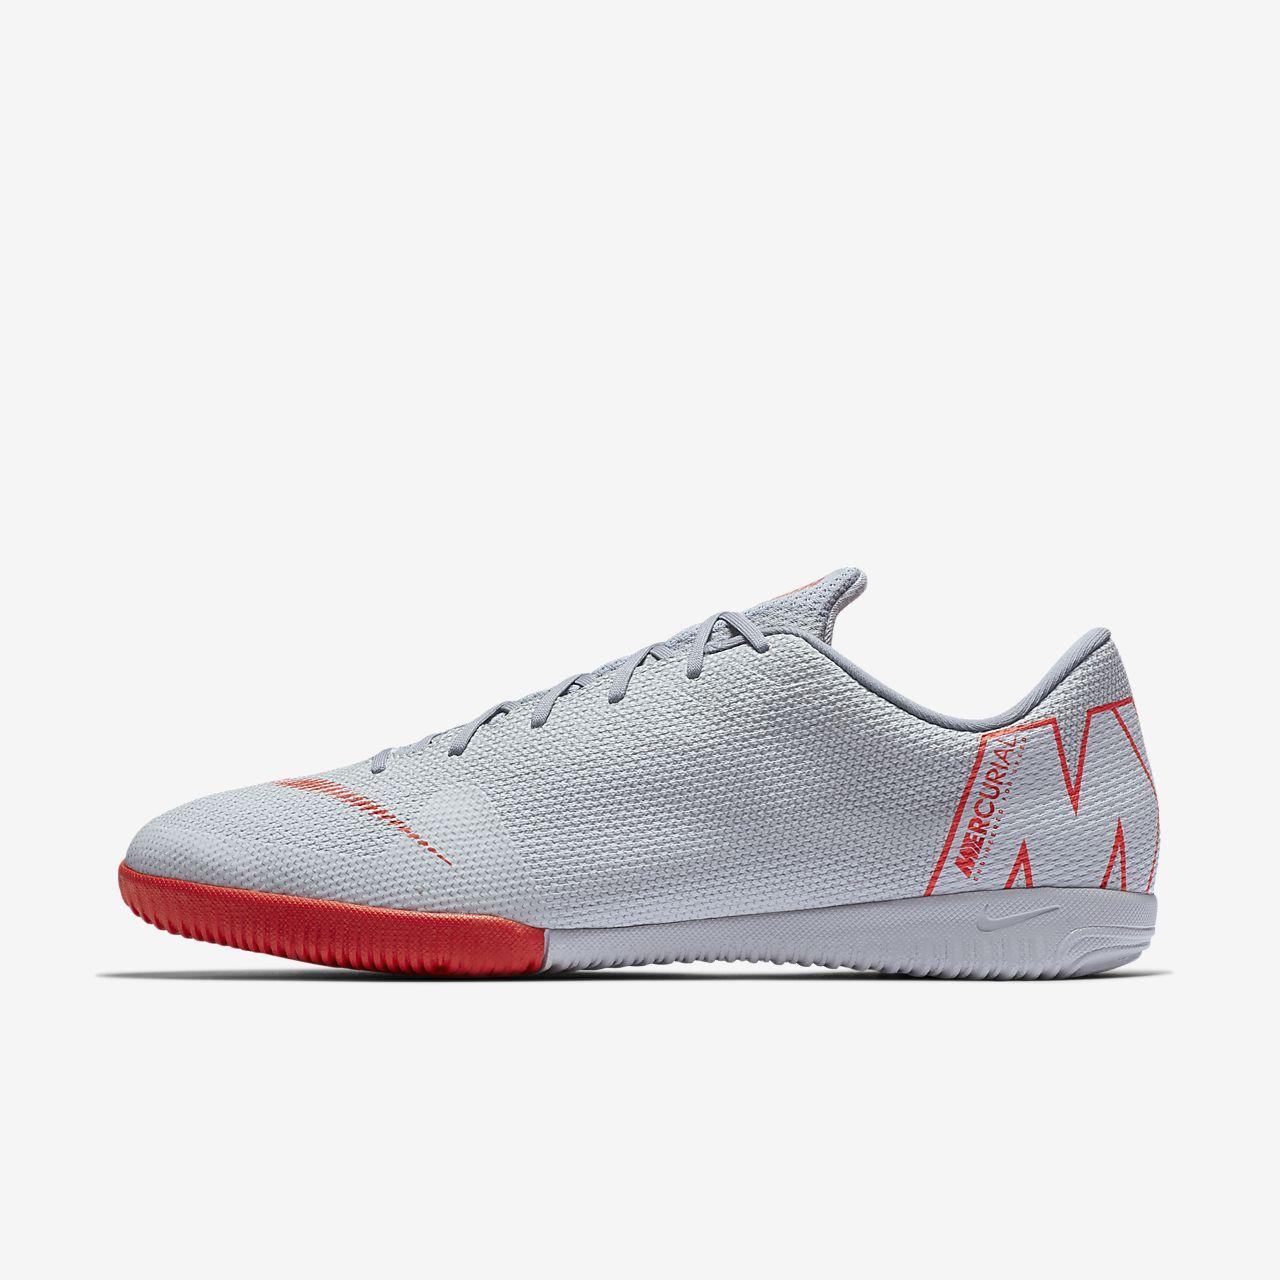 Sapatilhas de futsal Nike VaporX 12 Academy IC